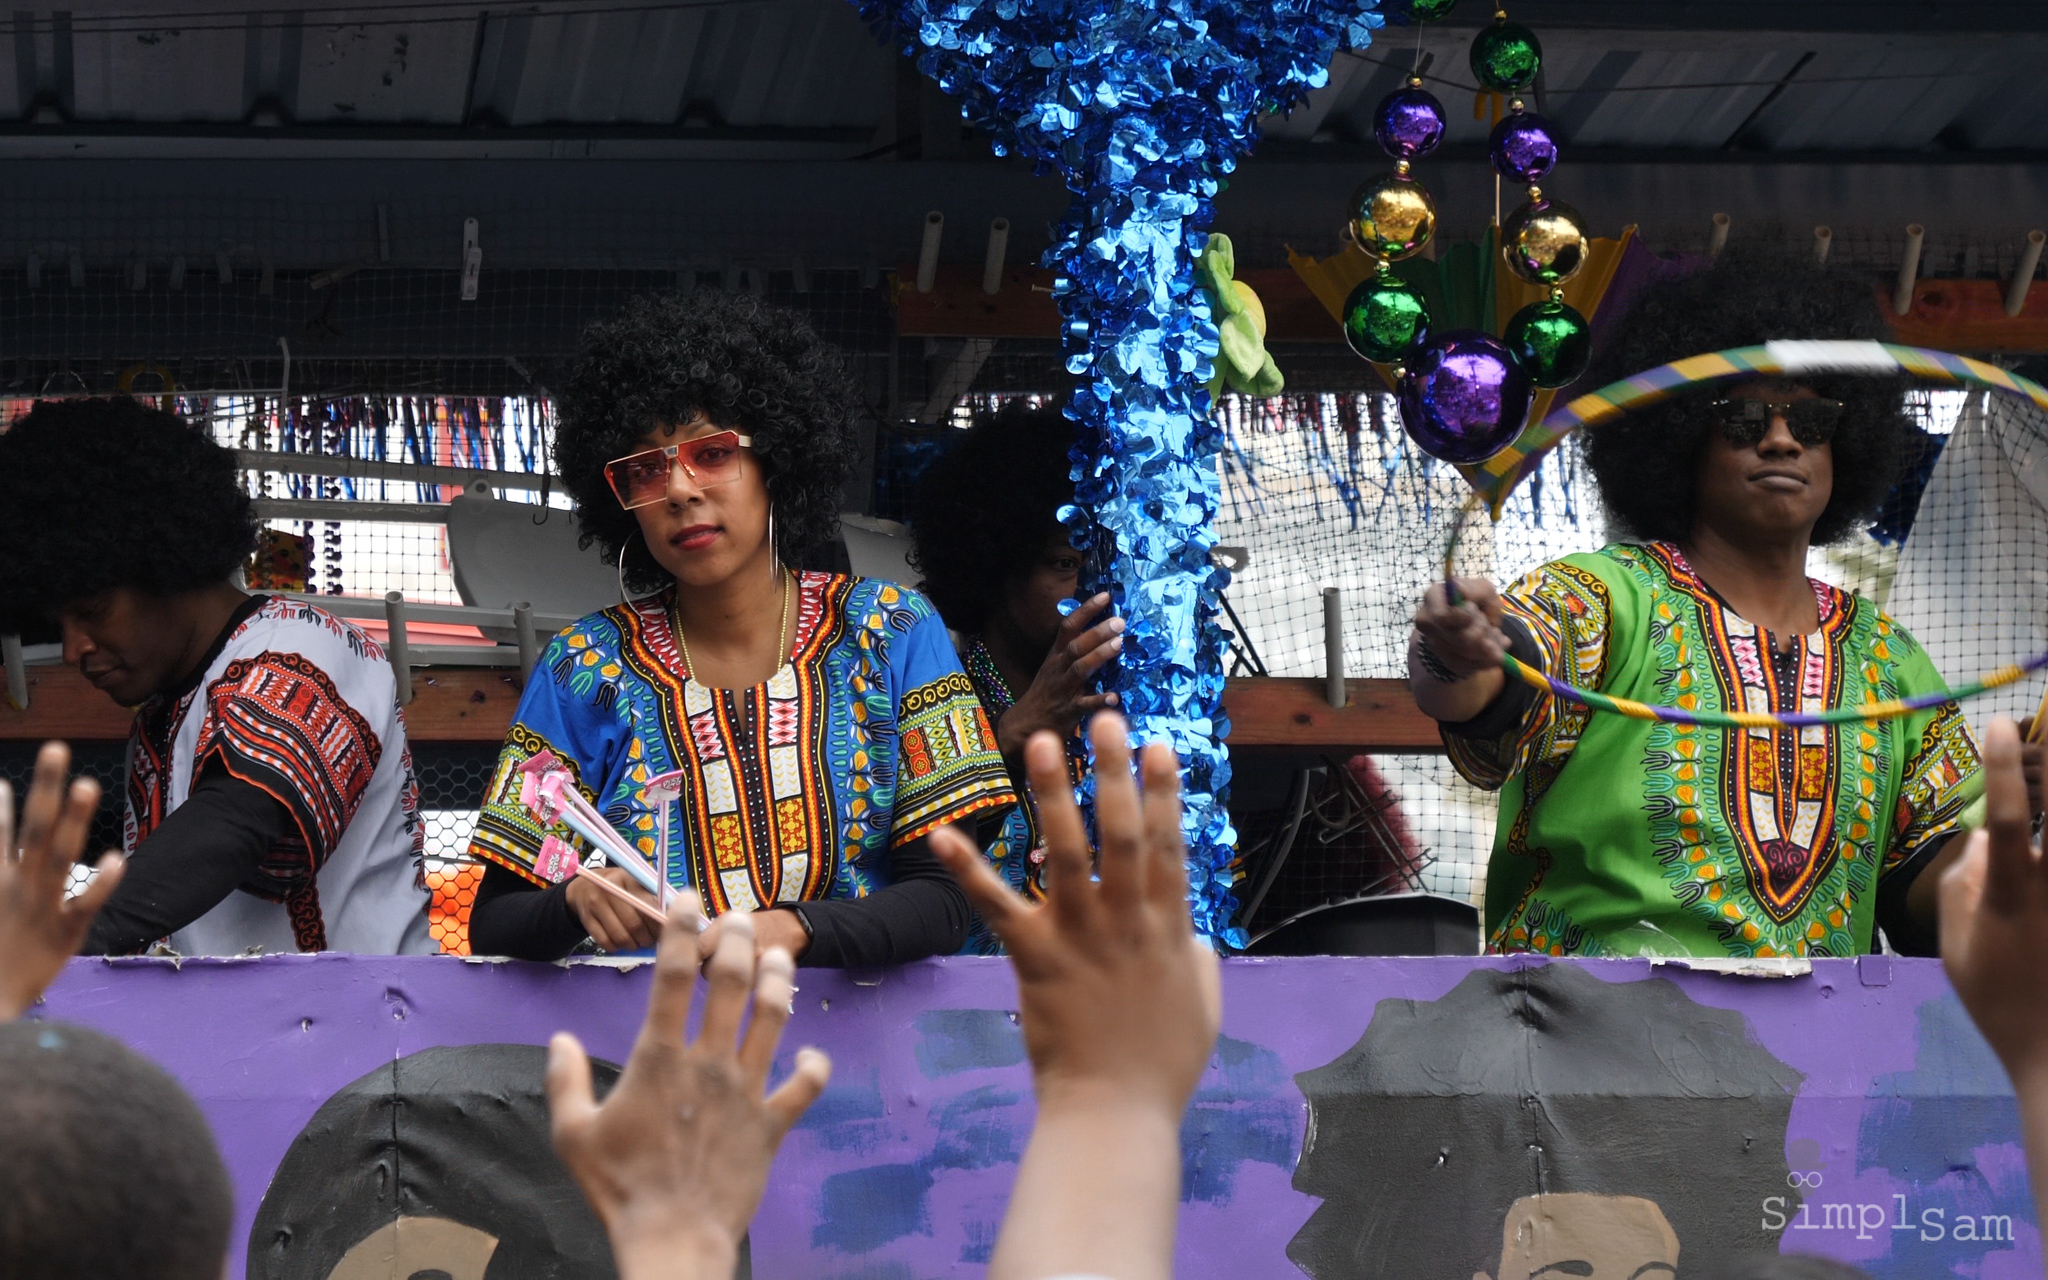 New Orleans Mardi Gras 2018 - Carnival Queen